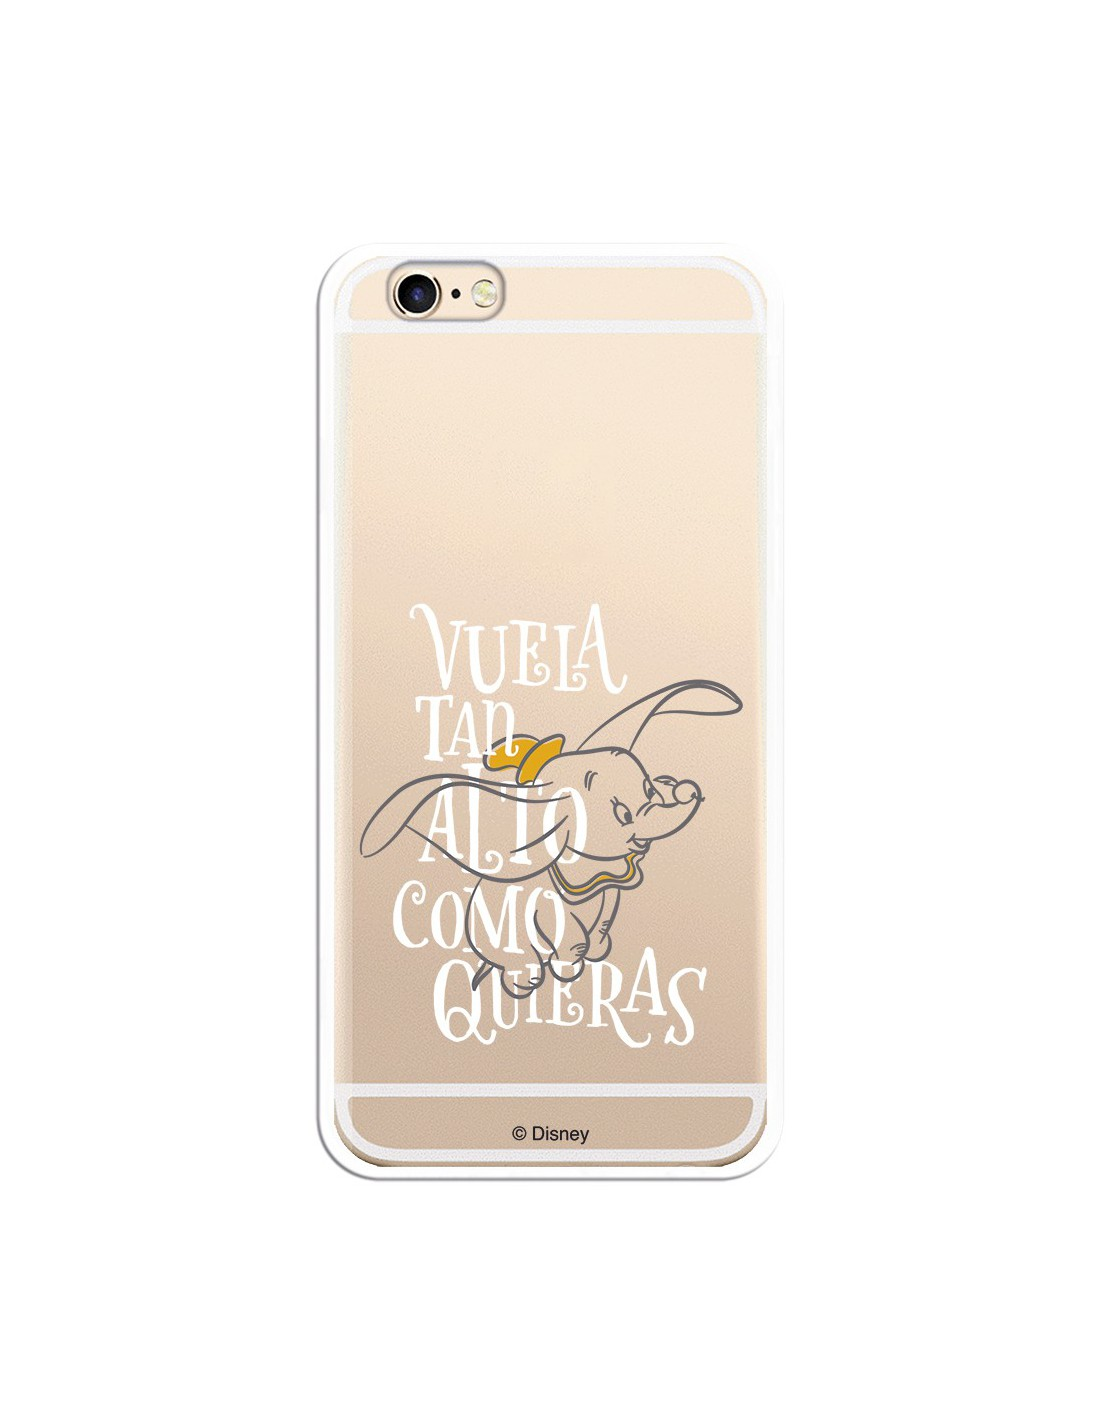 Funda Oficial Disney Dumbo Vuela tan alto Clear para iPhone 7 Plus